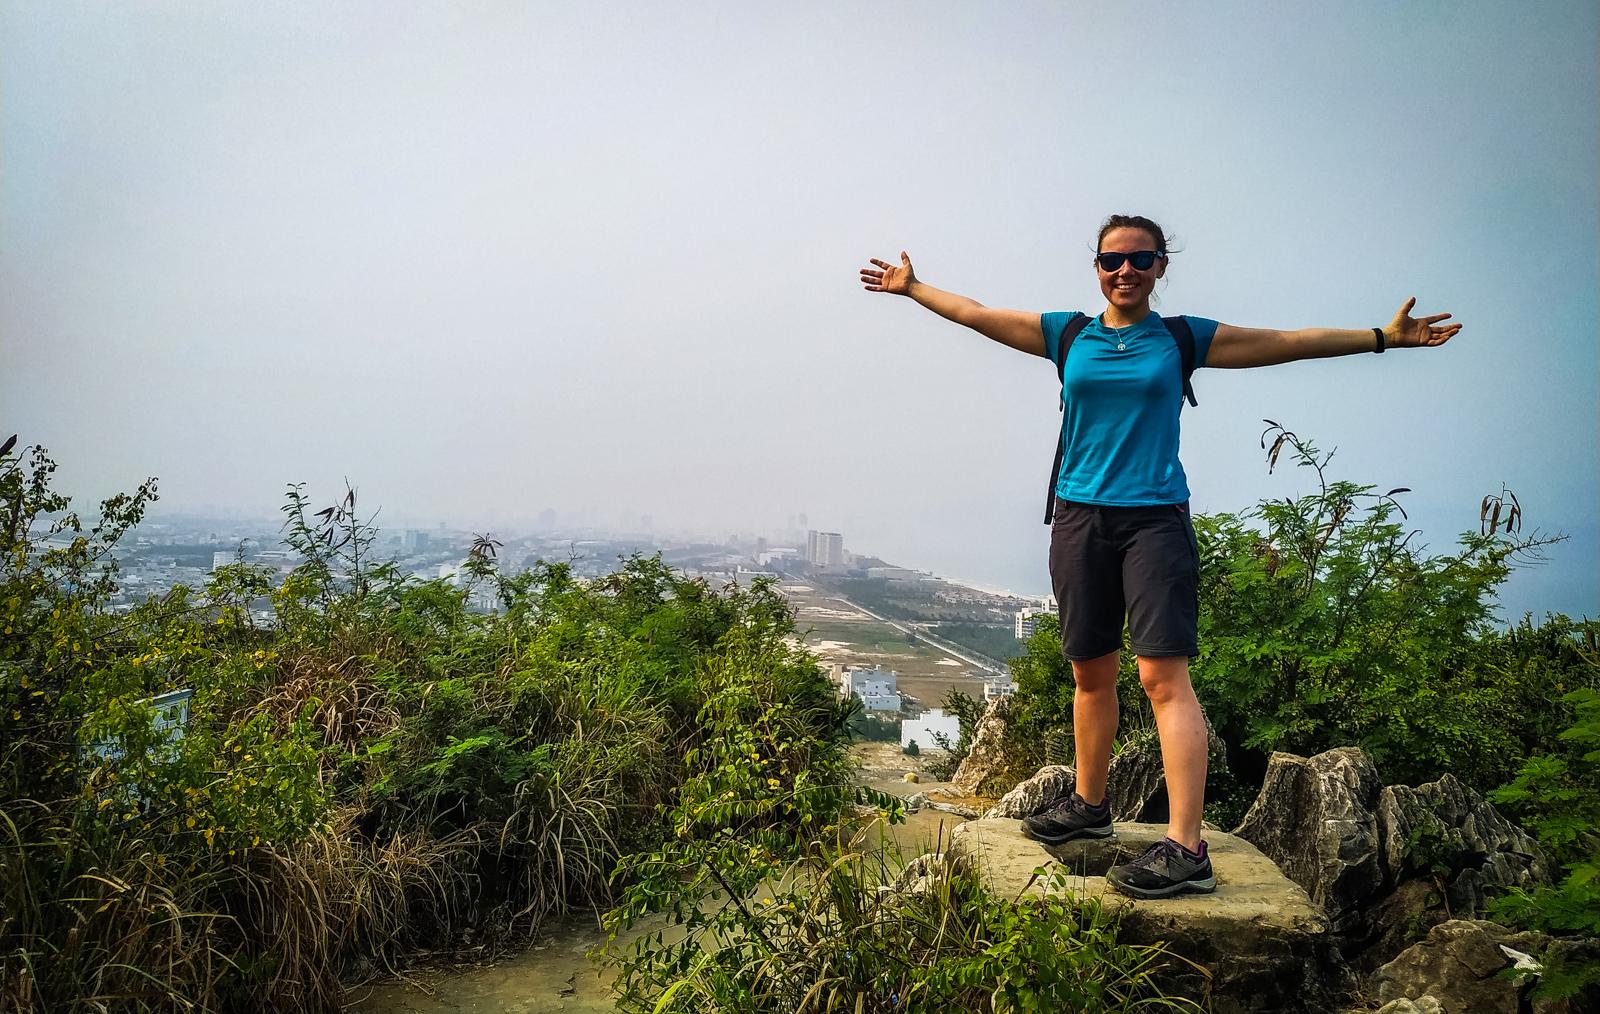 Danang - Marble mountains